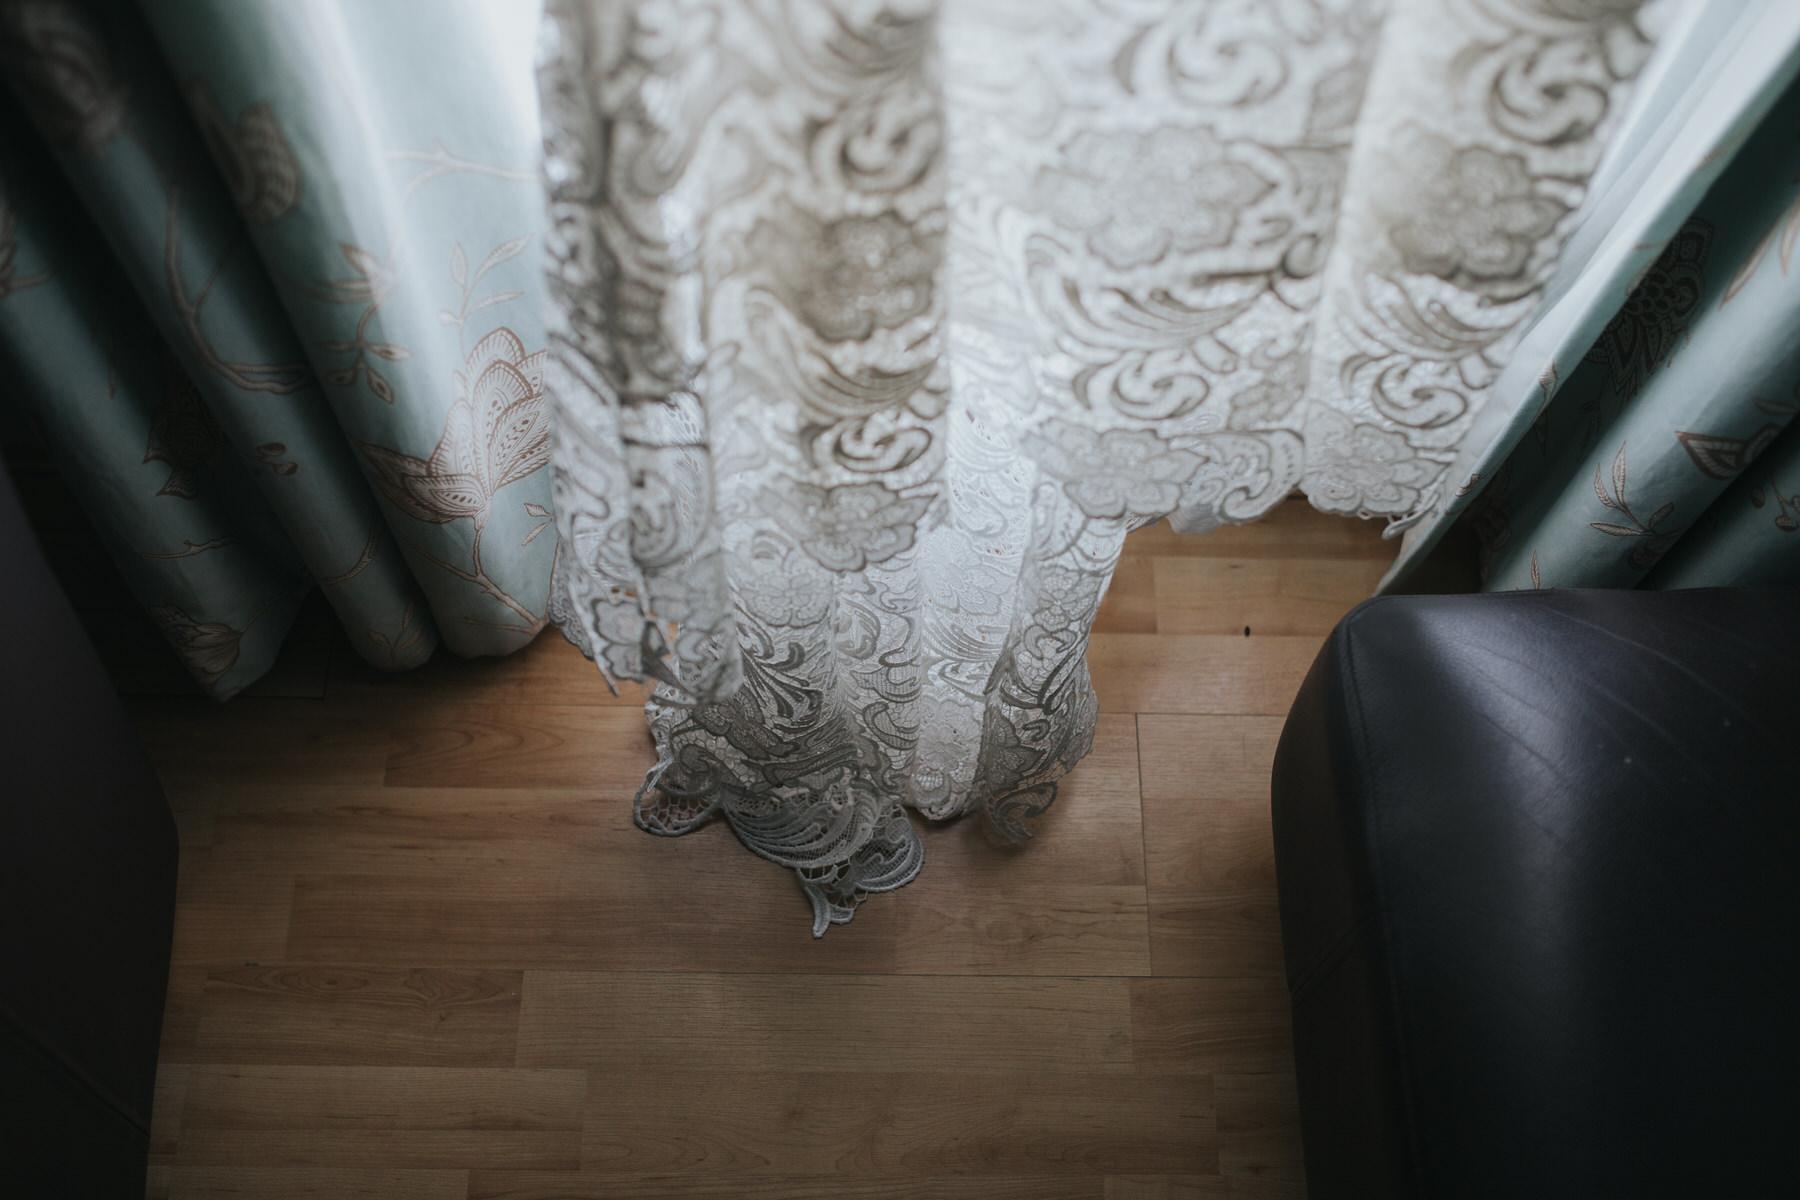 198 wedding dress lace detail Portmeirion.jpg